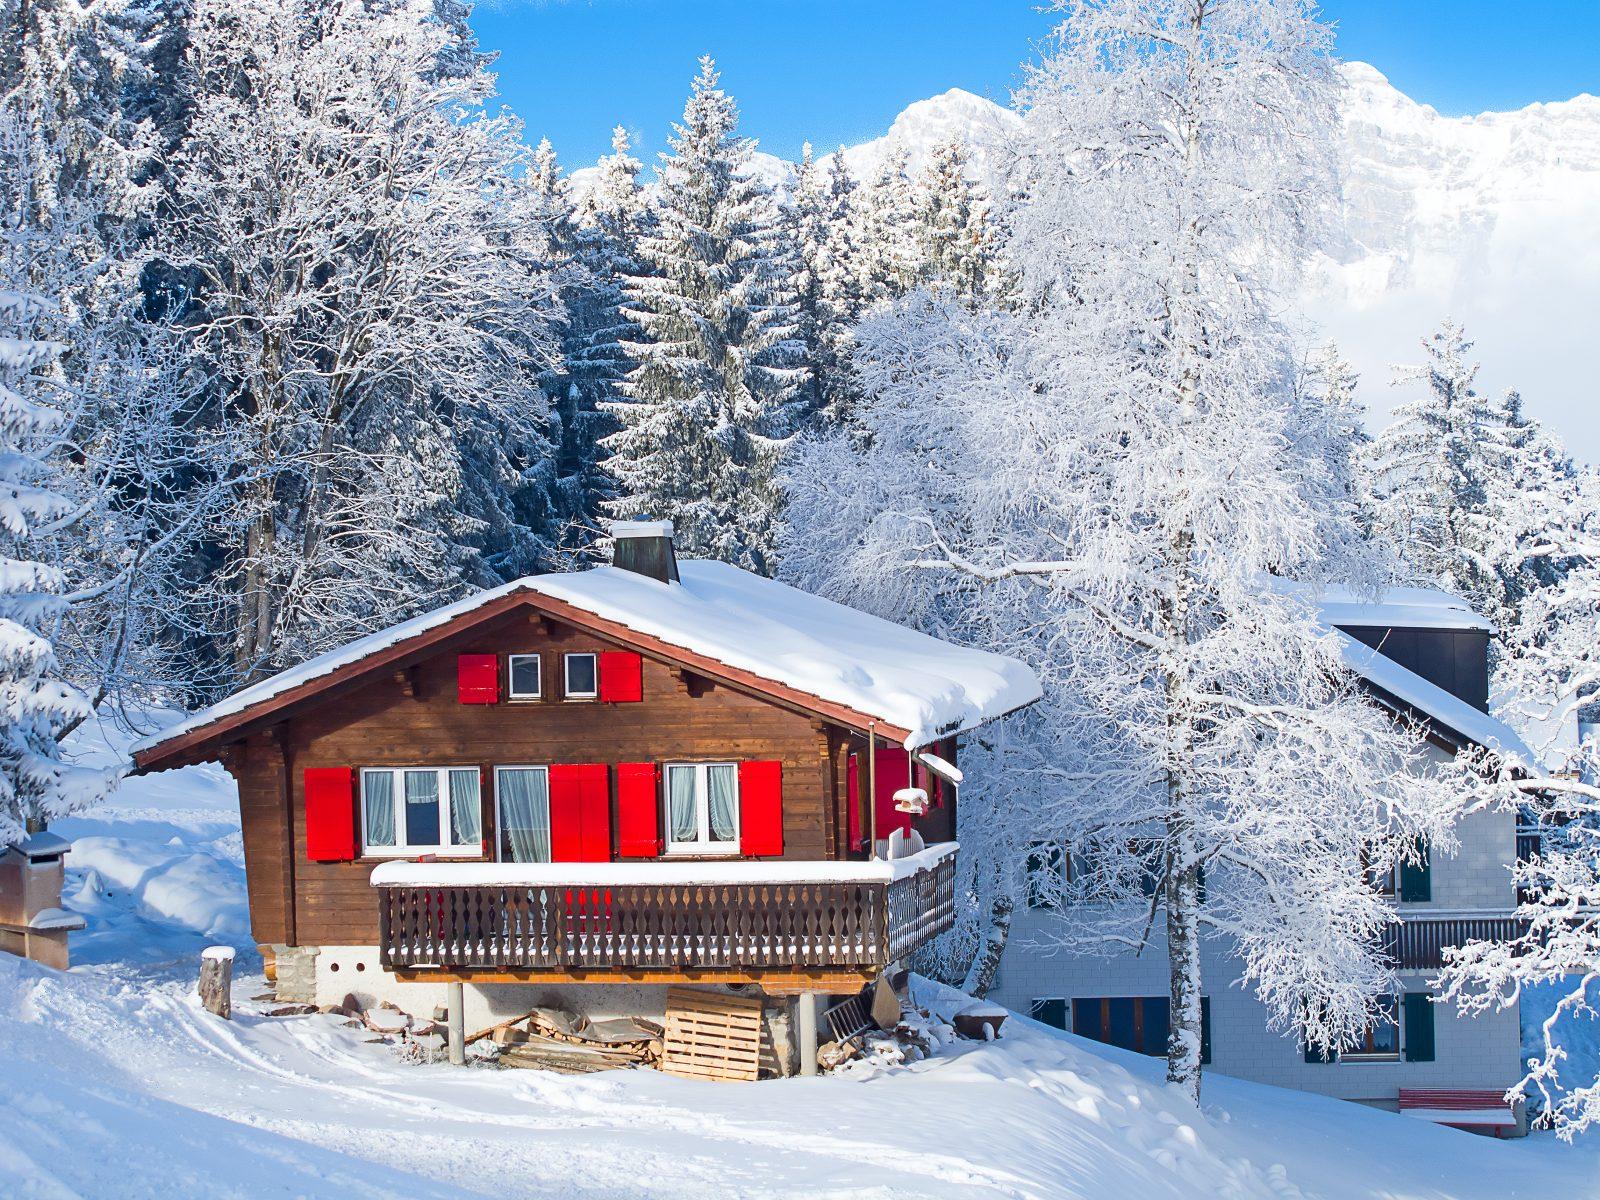 Chalet, sneeuw, wintersport